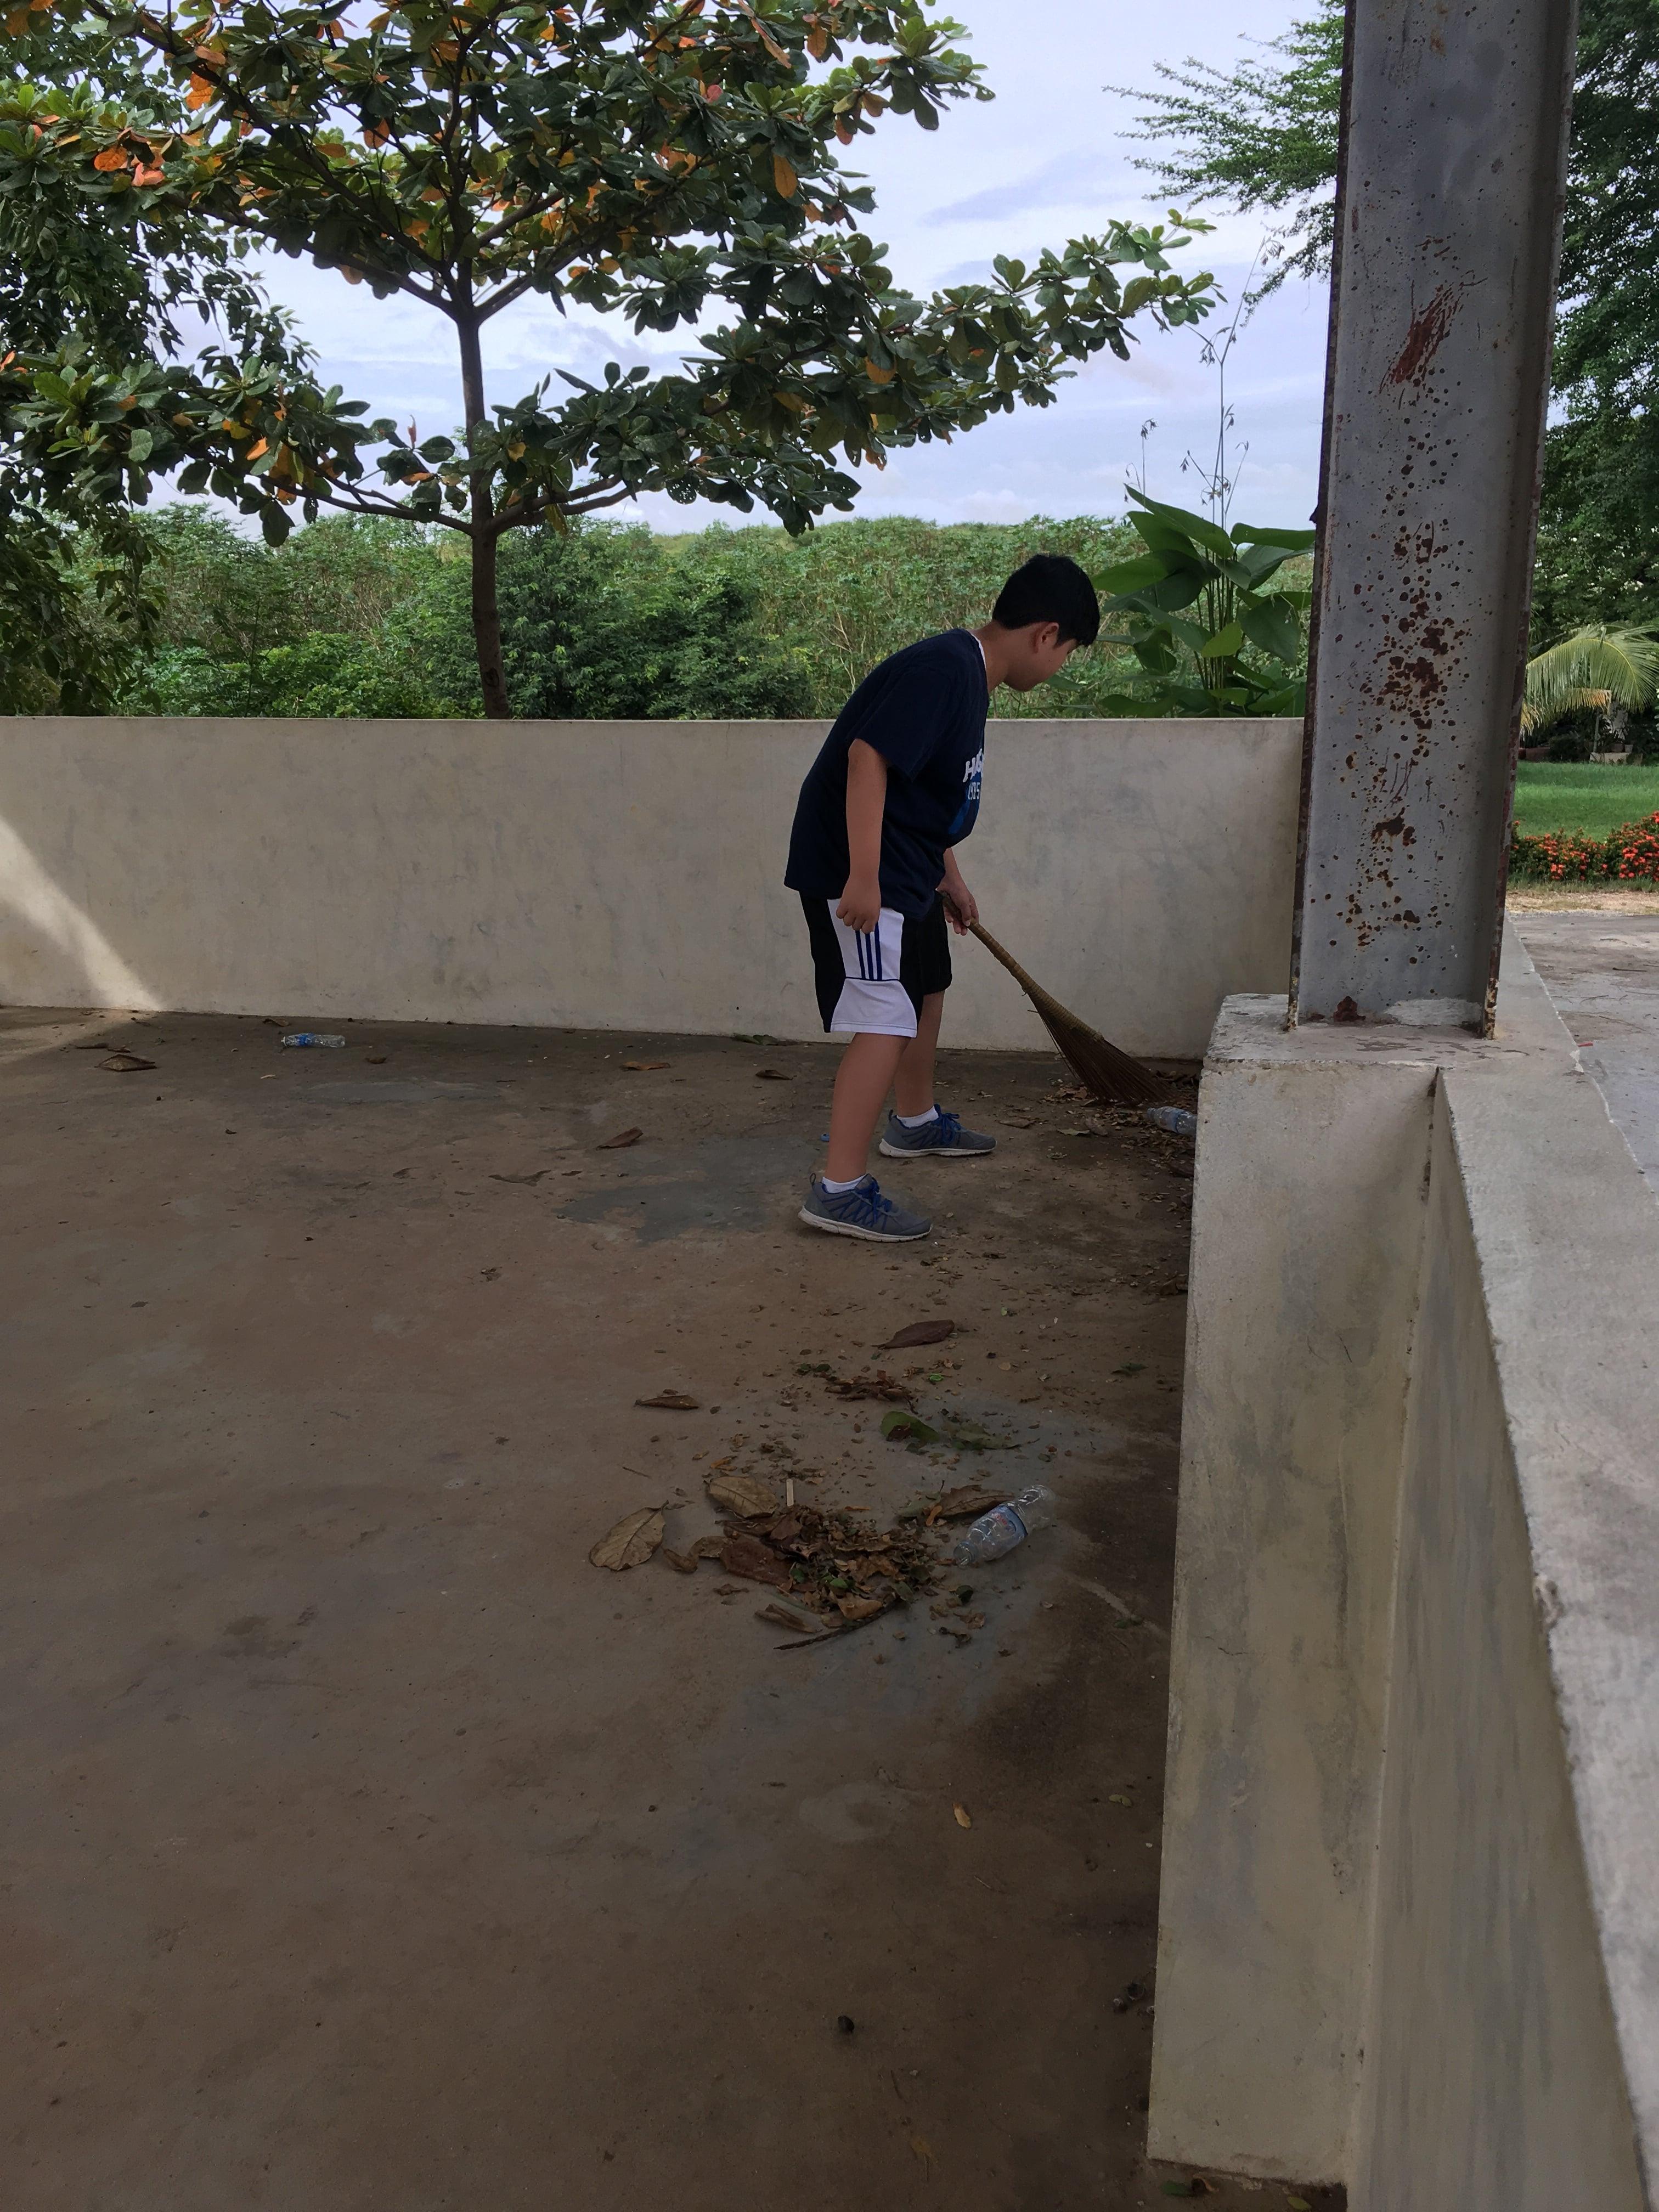 0866c9c1818f 2017 캄보디아 아웃리치   Cambodia Outreach - 밴쿠버 GDEW 열방교회